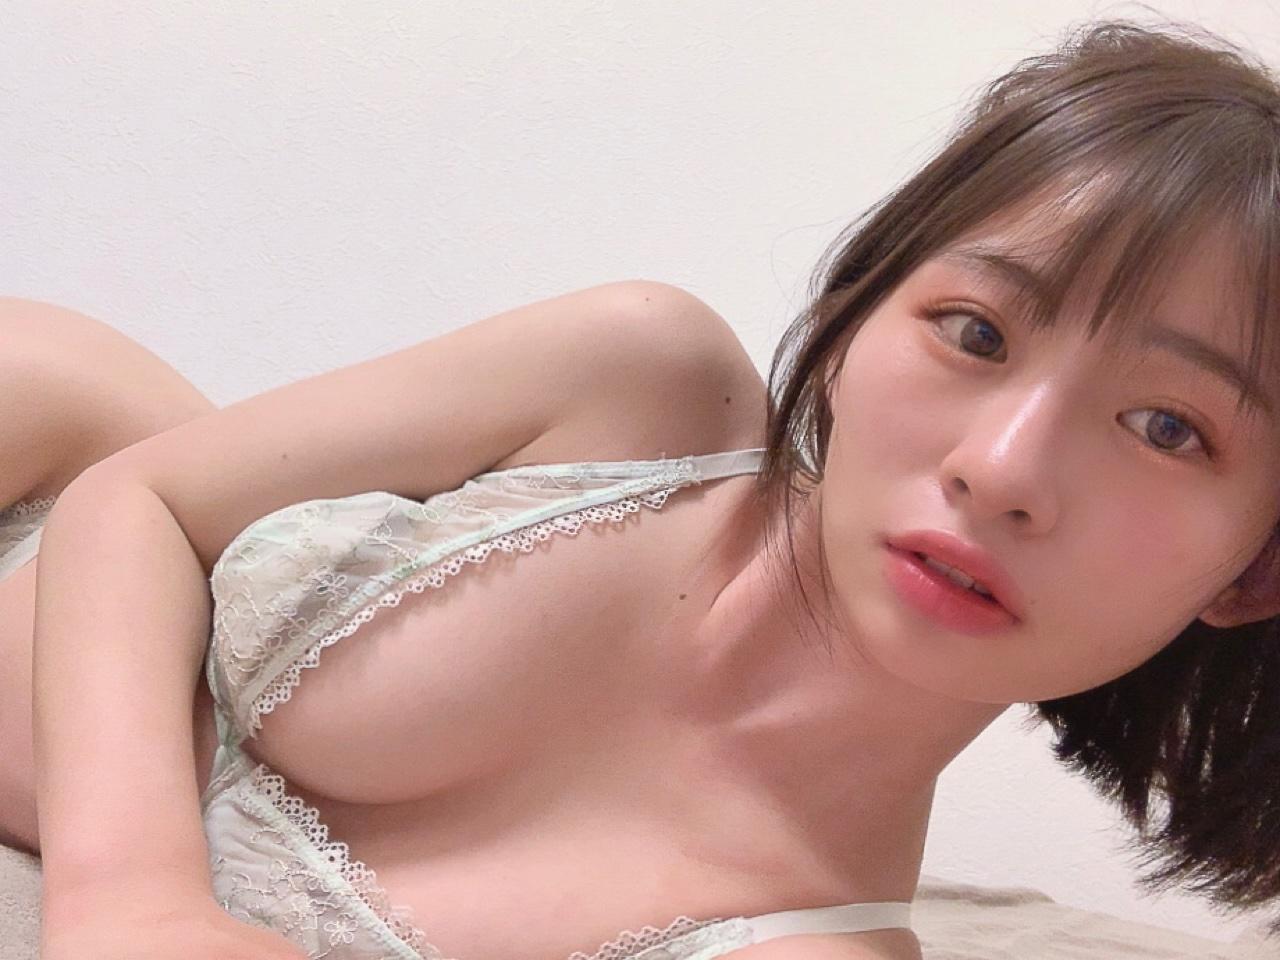 Mei Miyajima tân binh 2k của làng phim JAV 18+